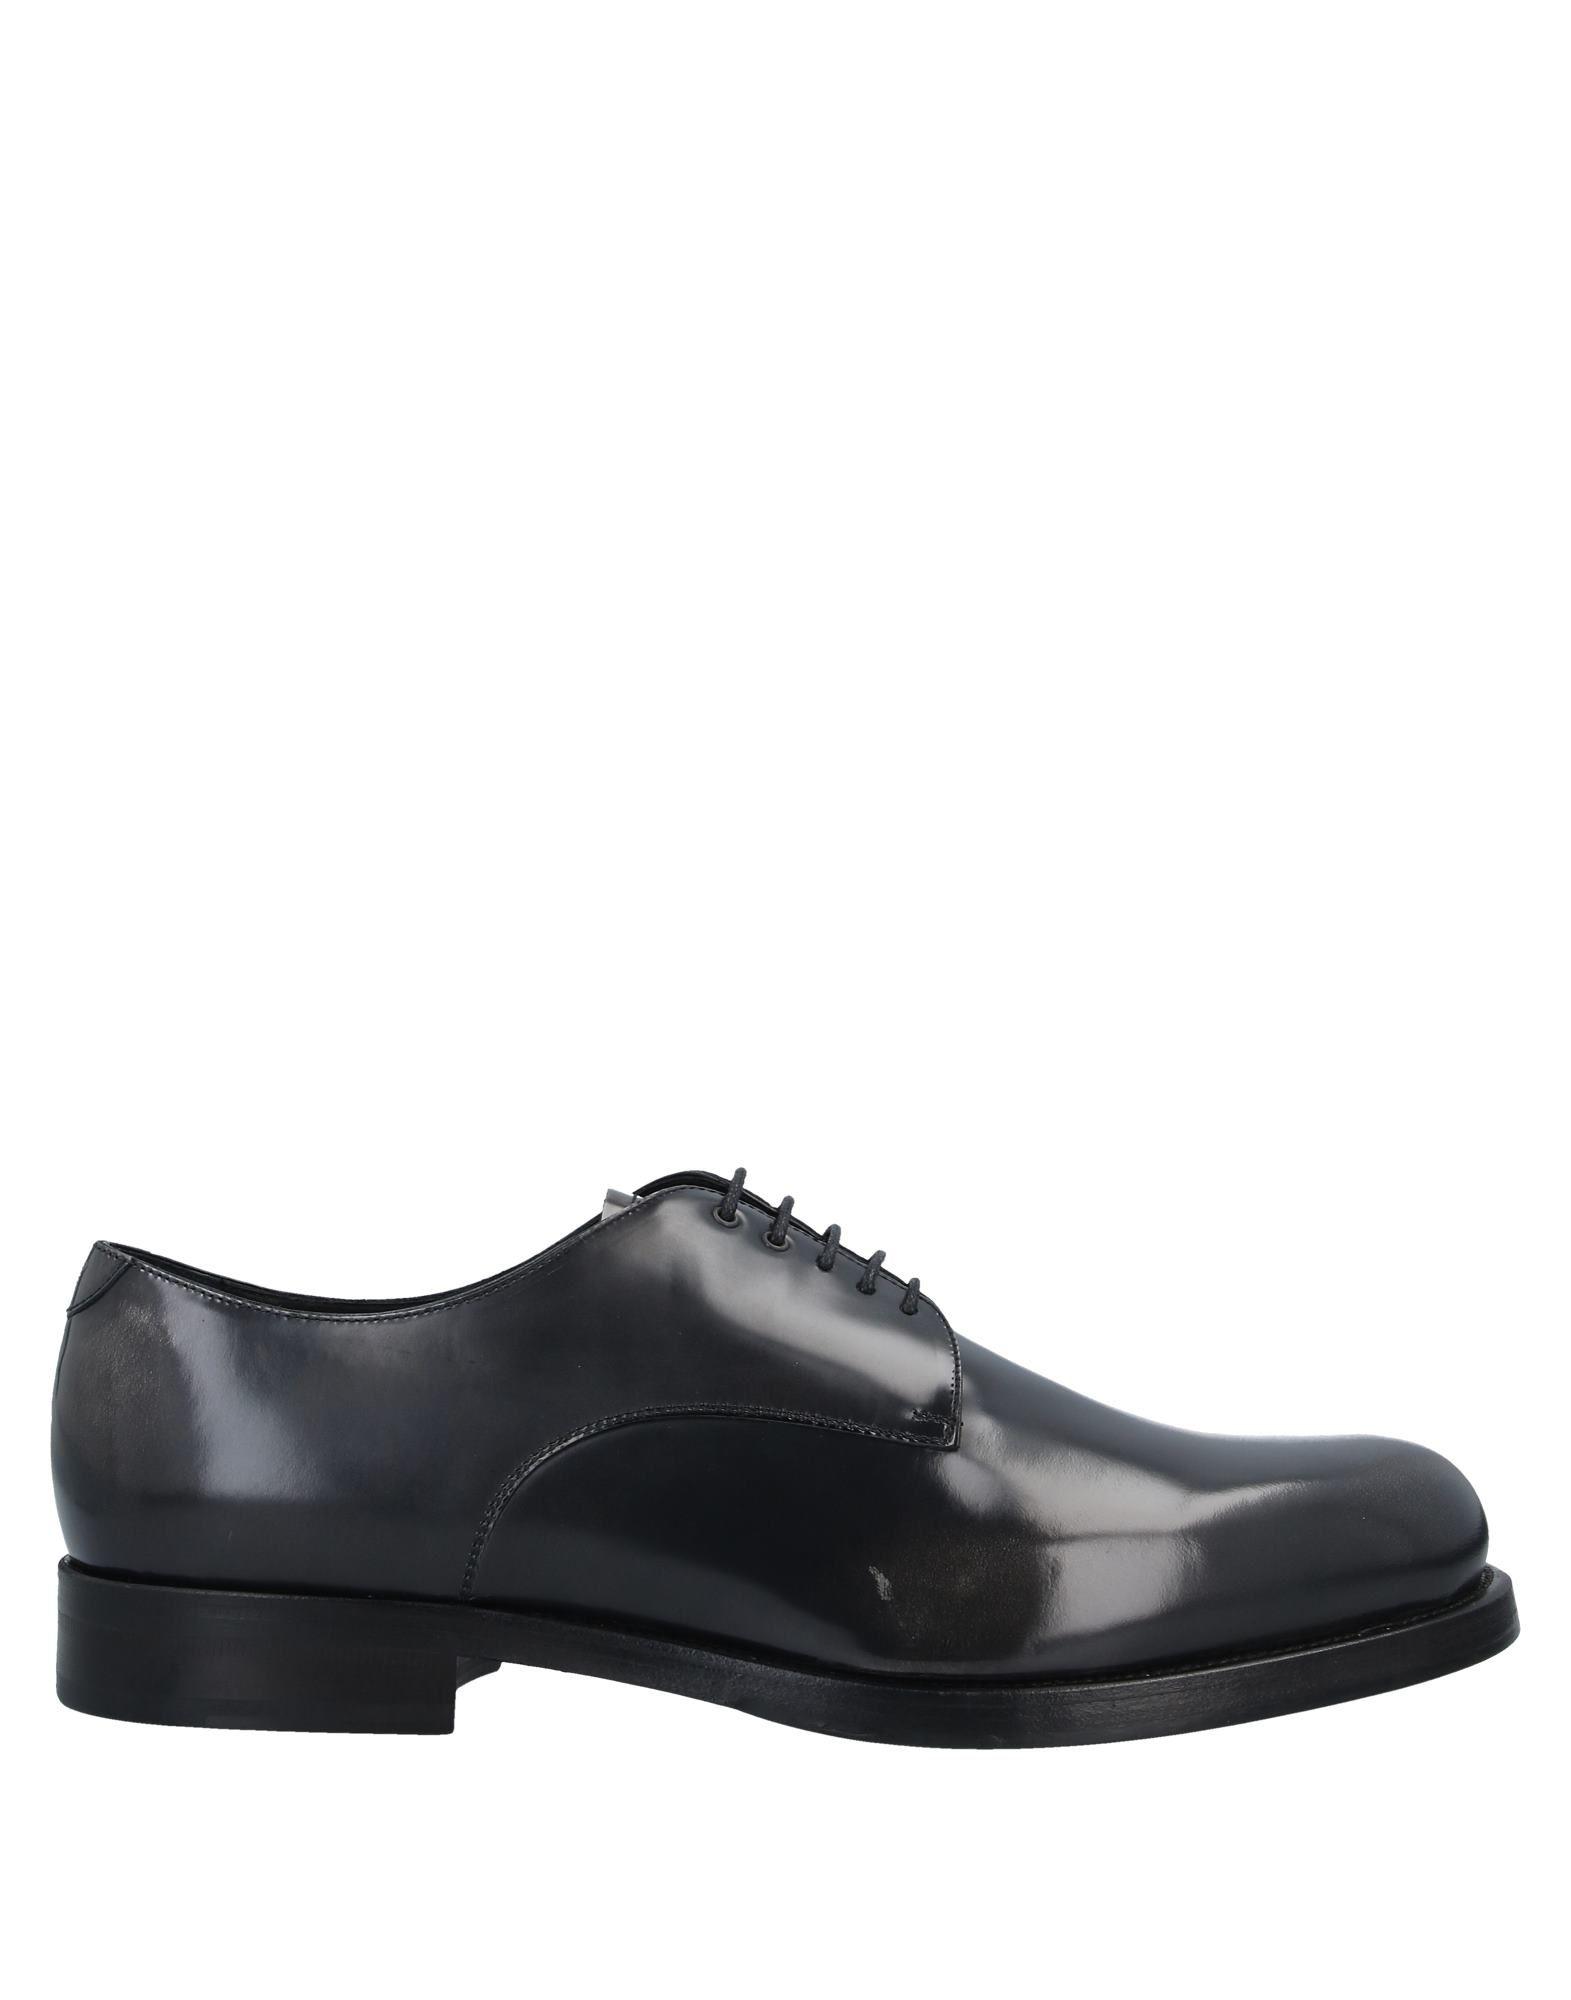 EMPORIO ARMANI Обувь на шнурках emporio armani обувь на шнурках